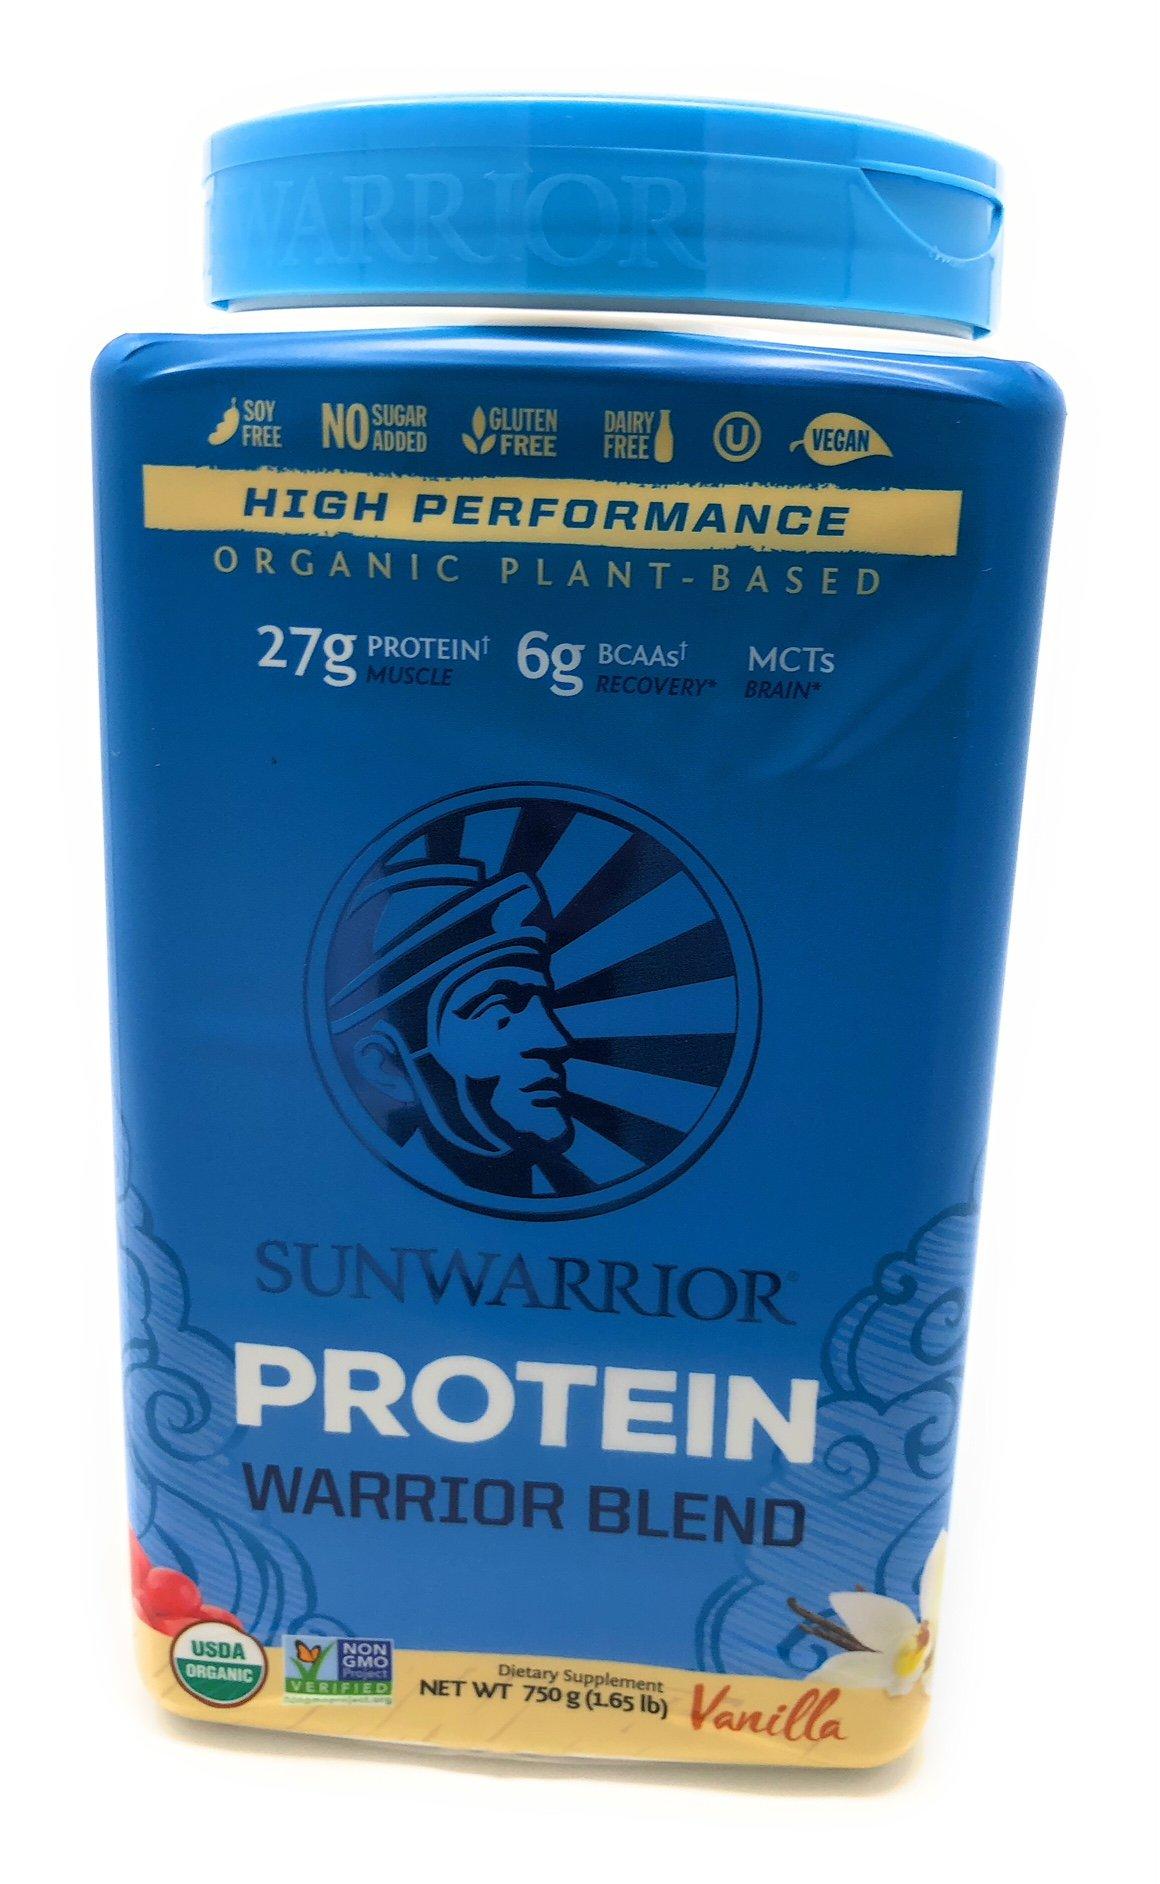 Sunwarrior - Warrior Blend, Plant Based, Raw Vegan Protein Powder with Peas & Hemp, Vanilla, 30 Servings